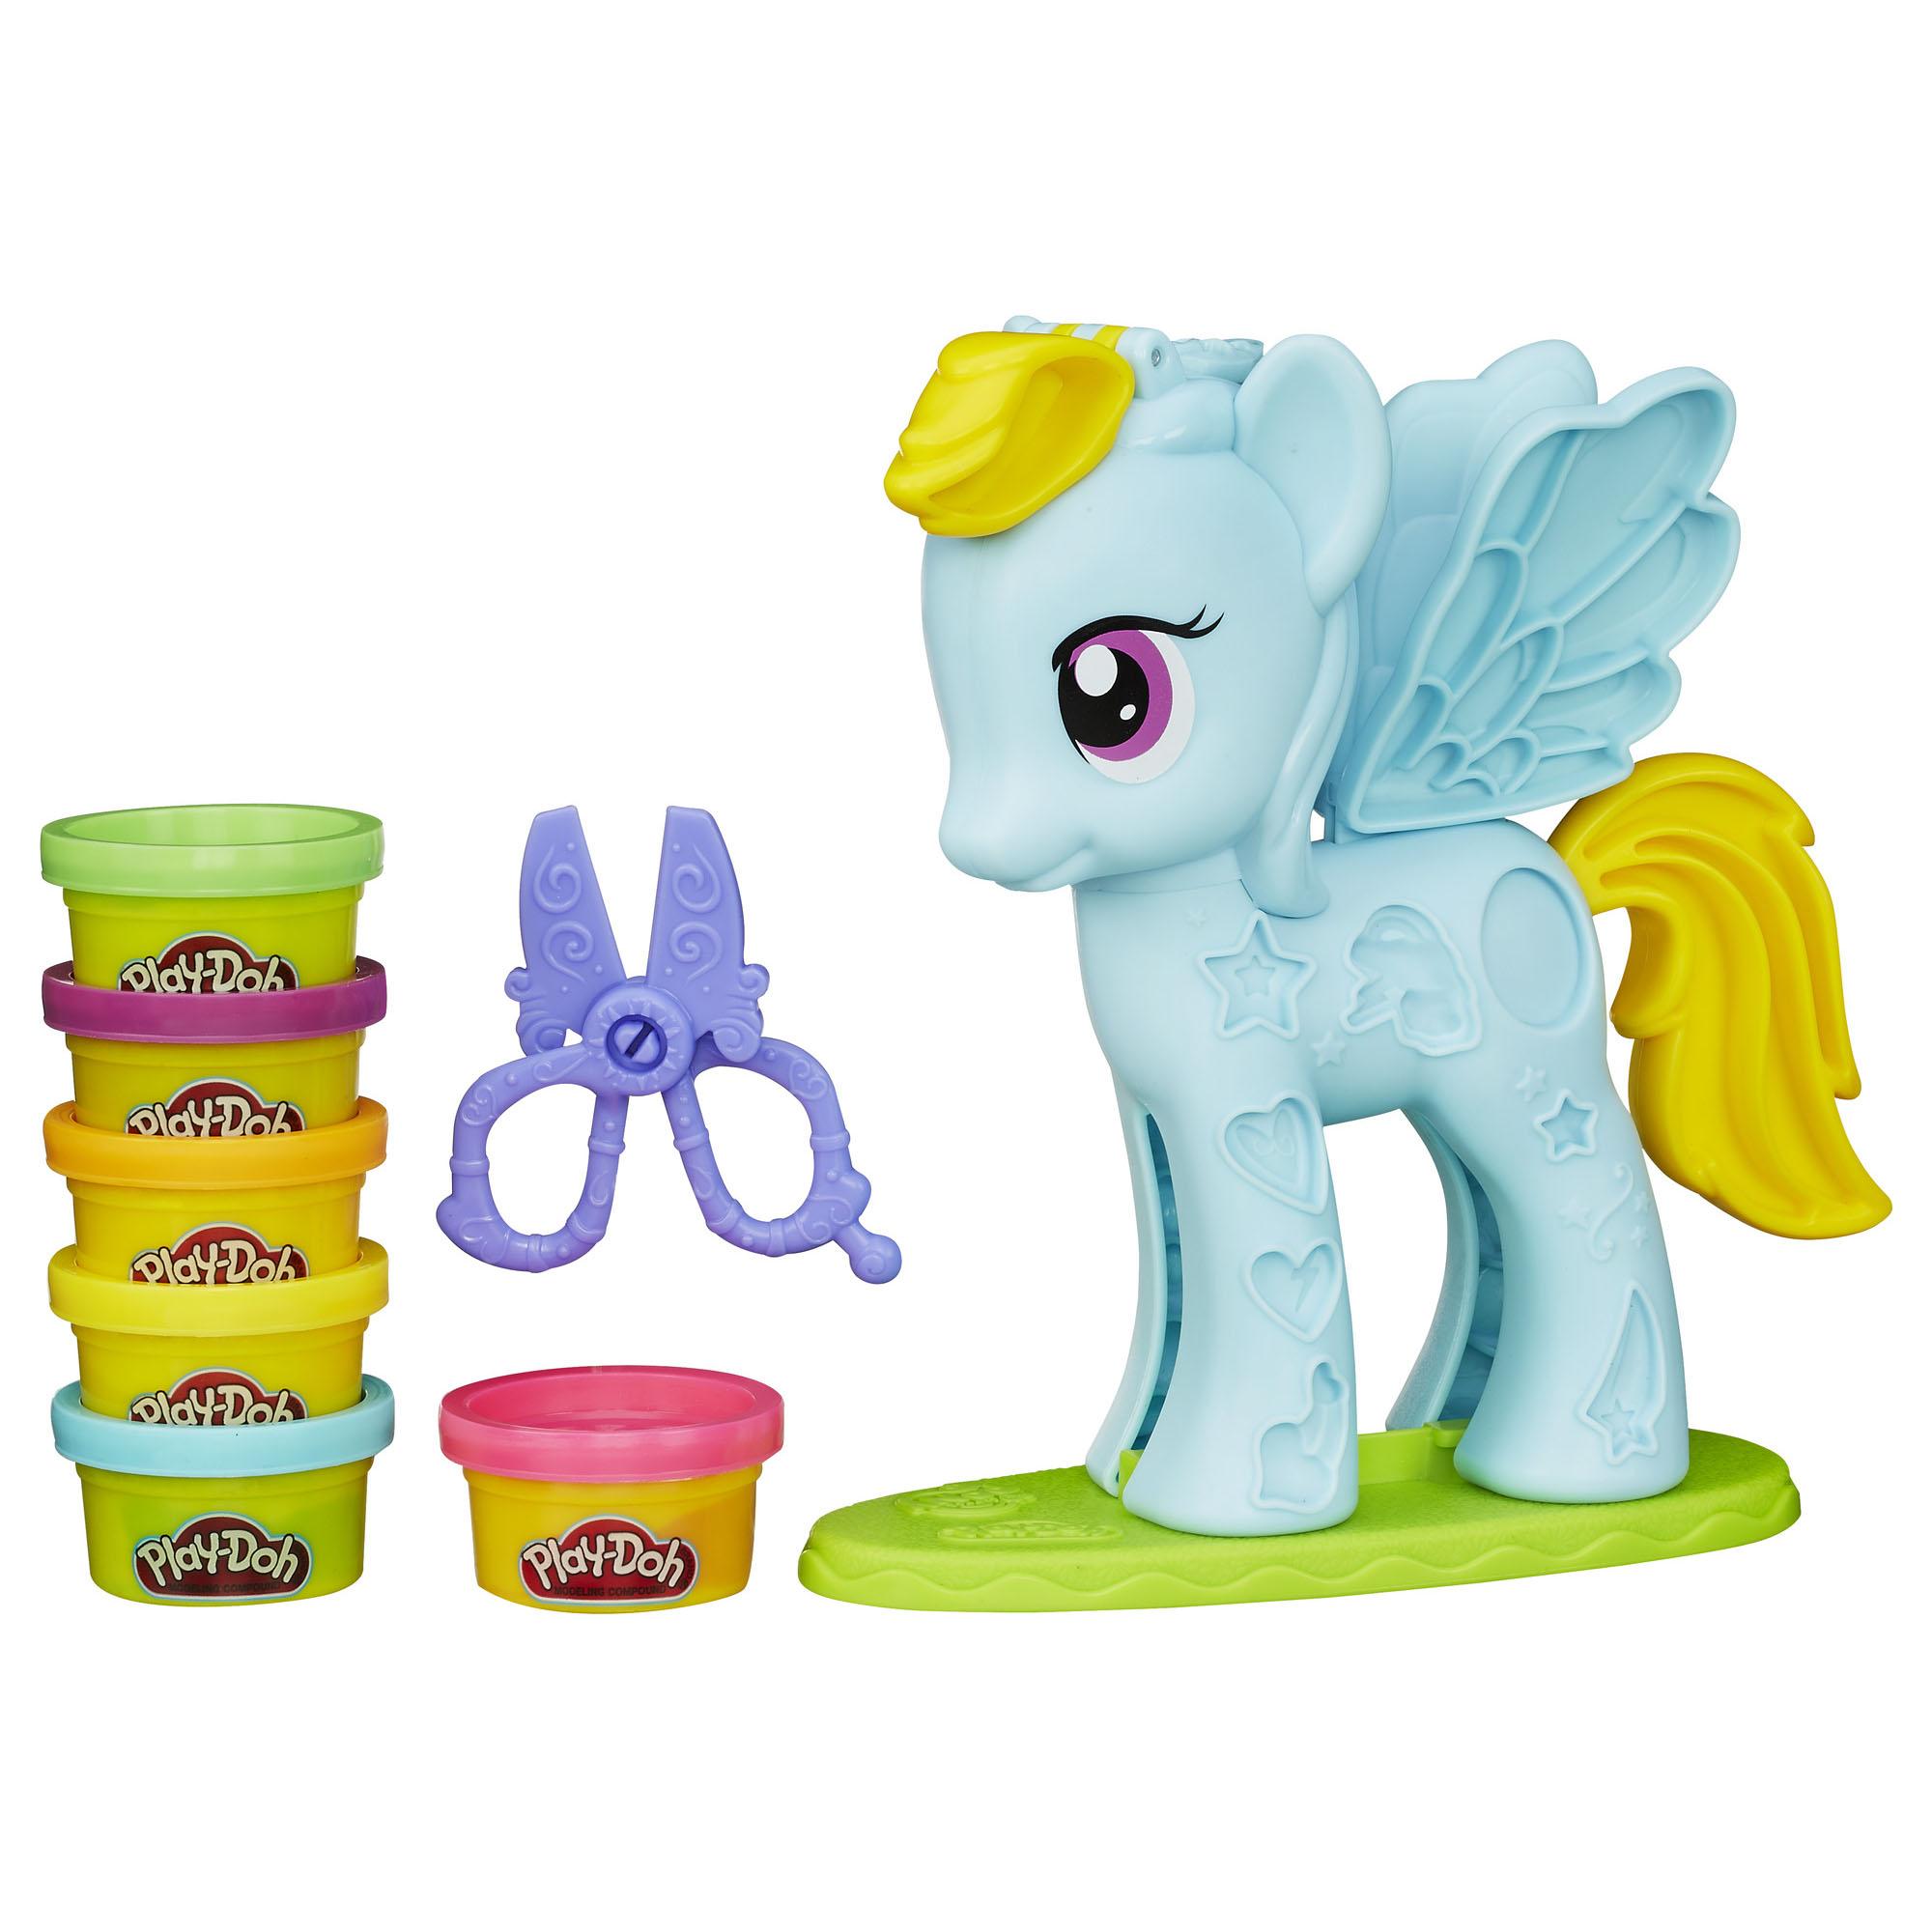 Play-Doh My Little Pony Rainbow Dash Style Salon Playset 004W006619519002